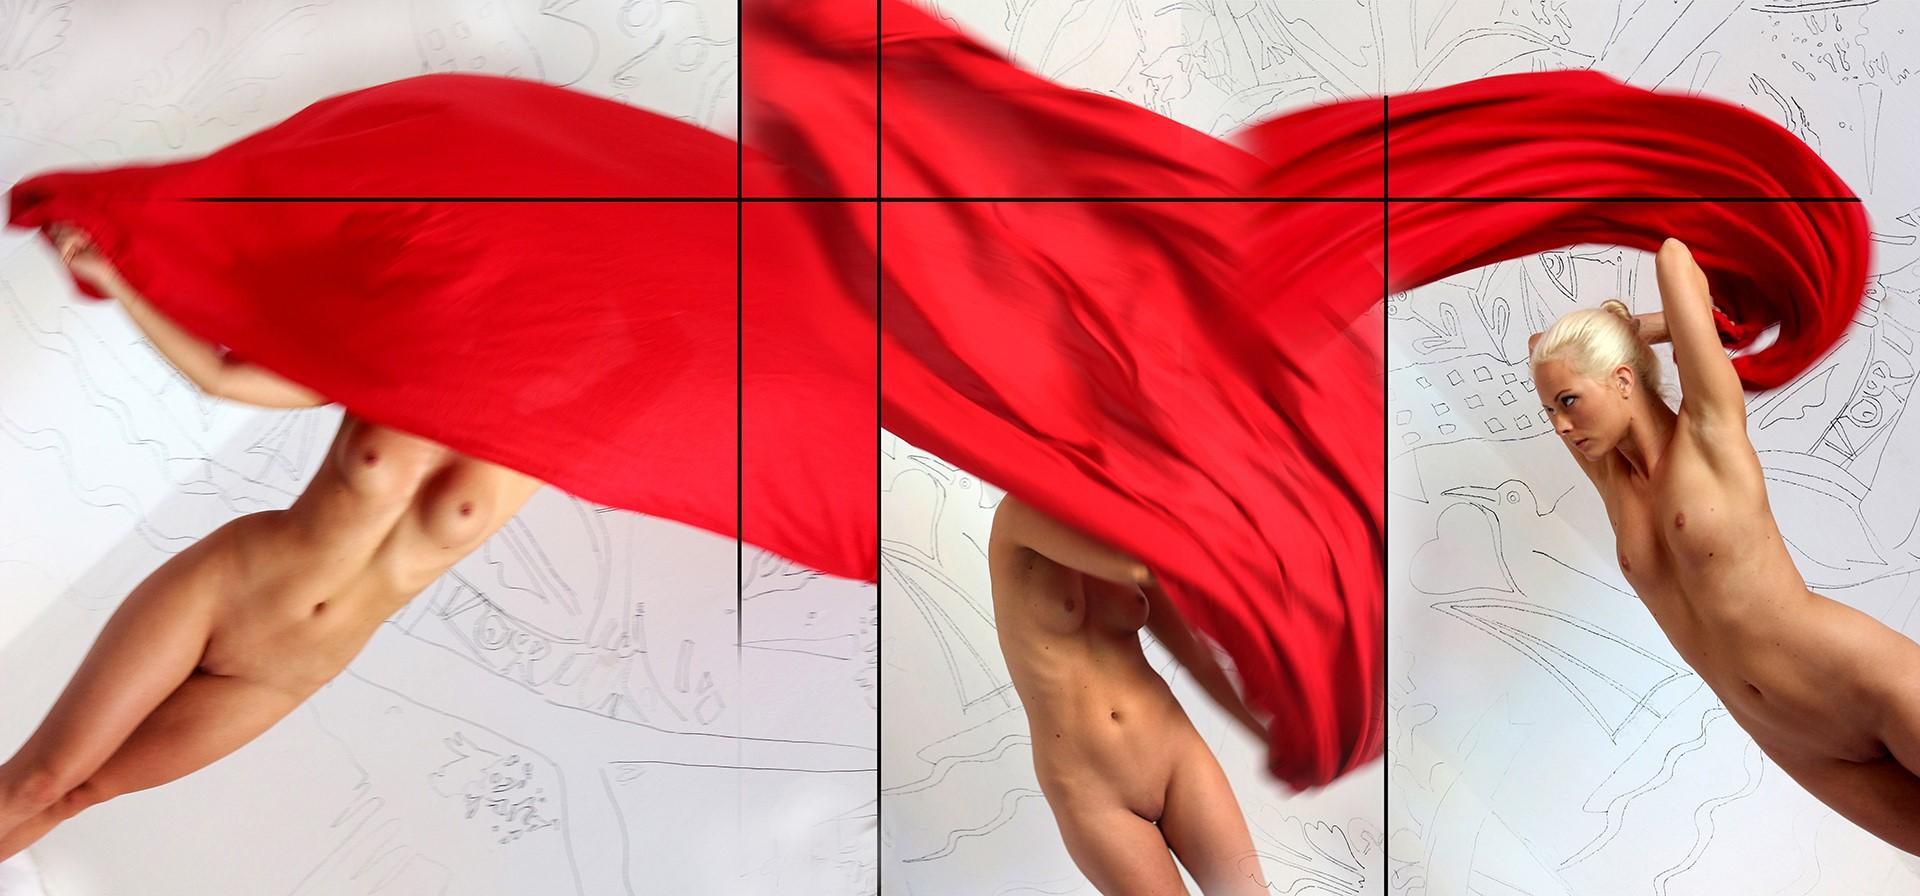 Eifert János. Zsófi vörös drapériával / Nude with Red Drapery